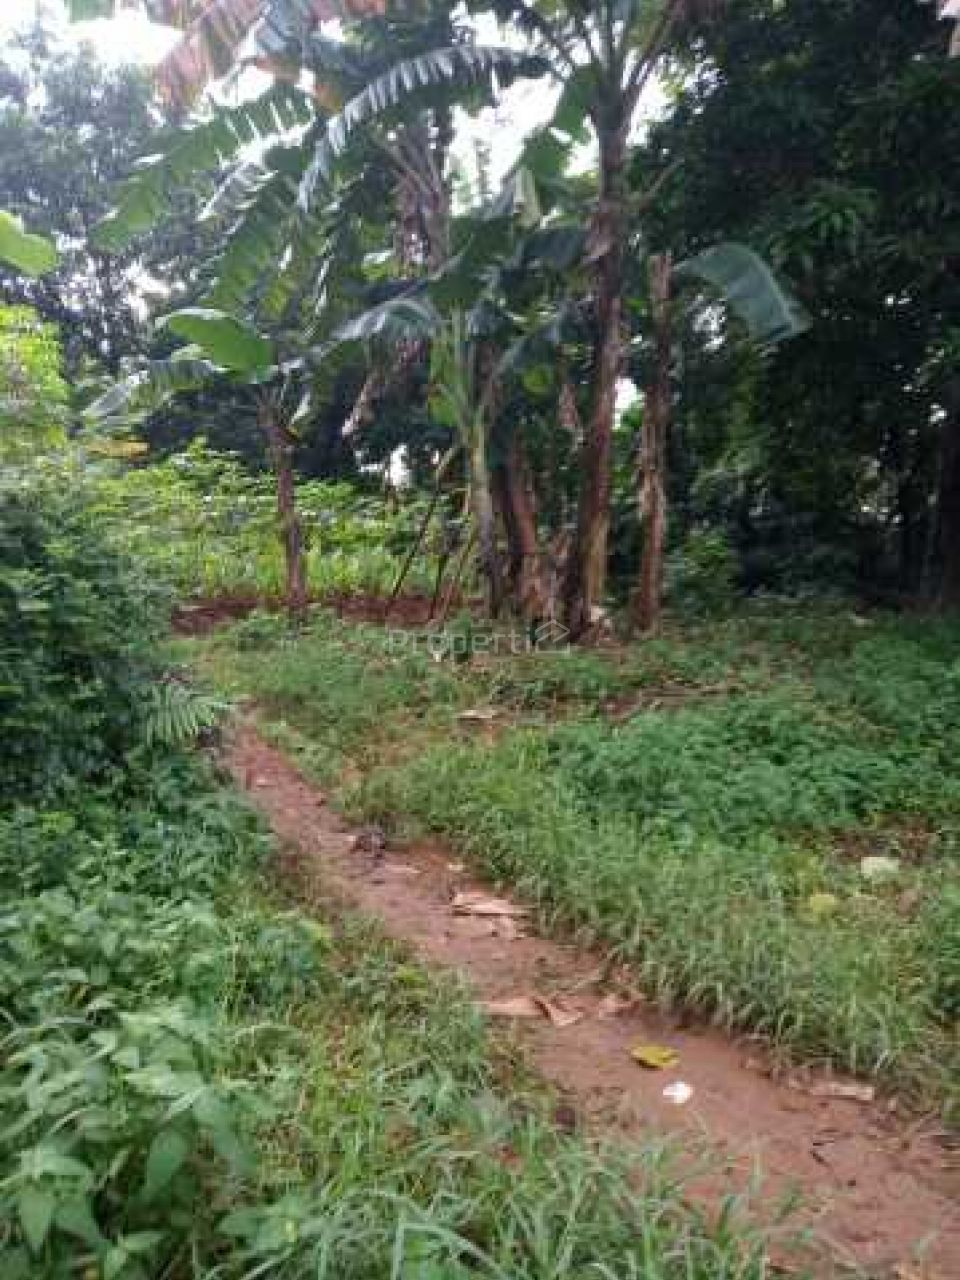 Tanah Datar Siap Garap di Cikeas , Jawa Barat